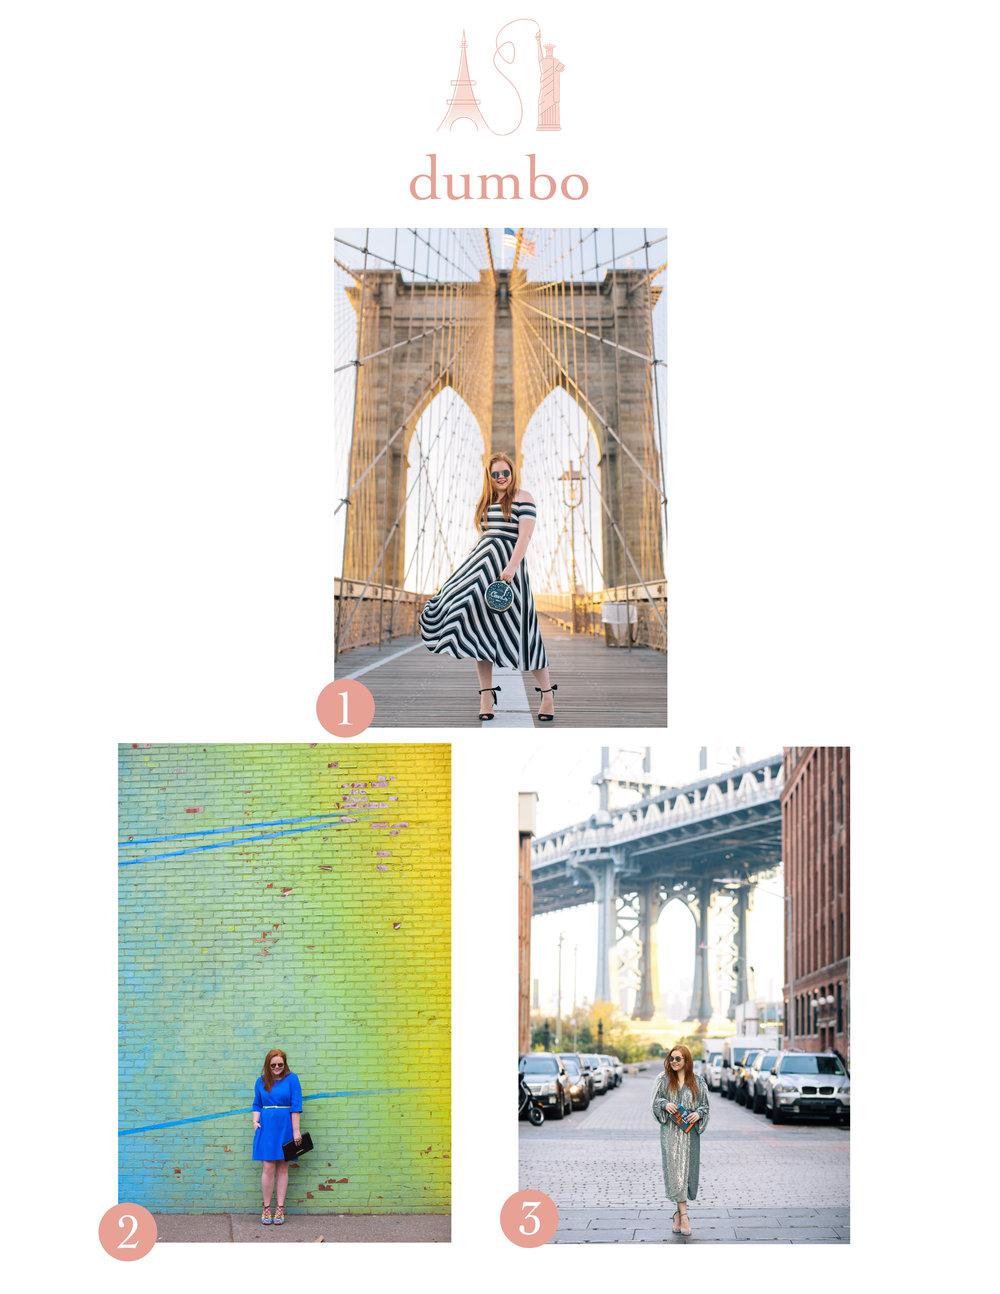 dumbo_photo_locations.jpg